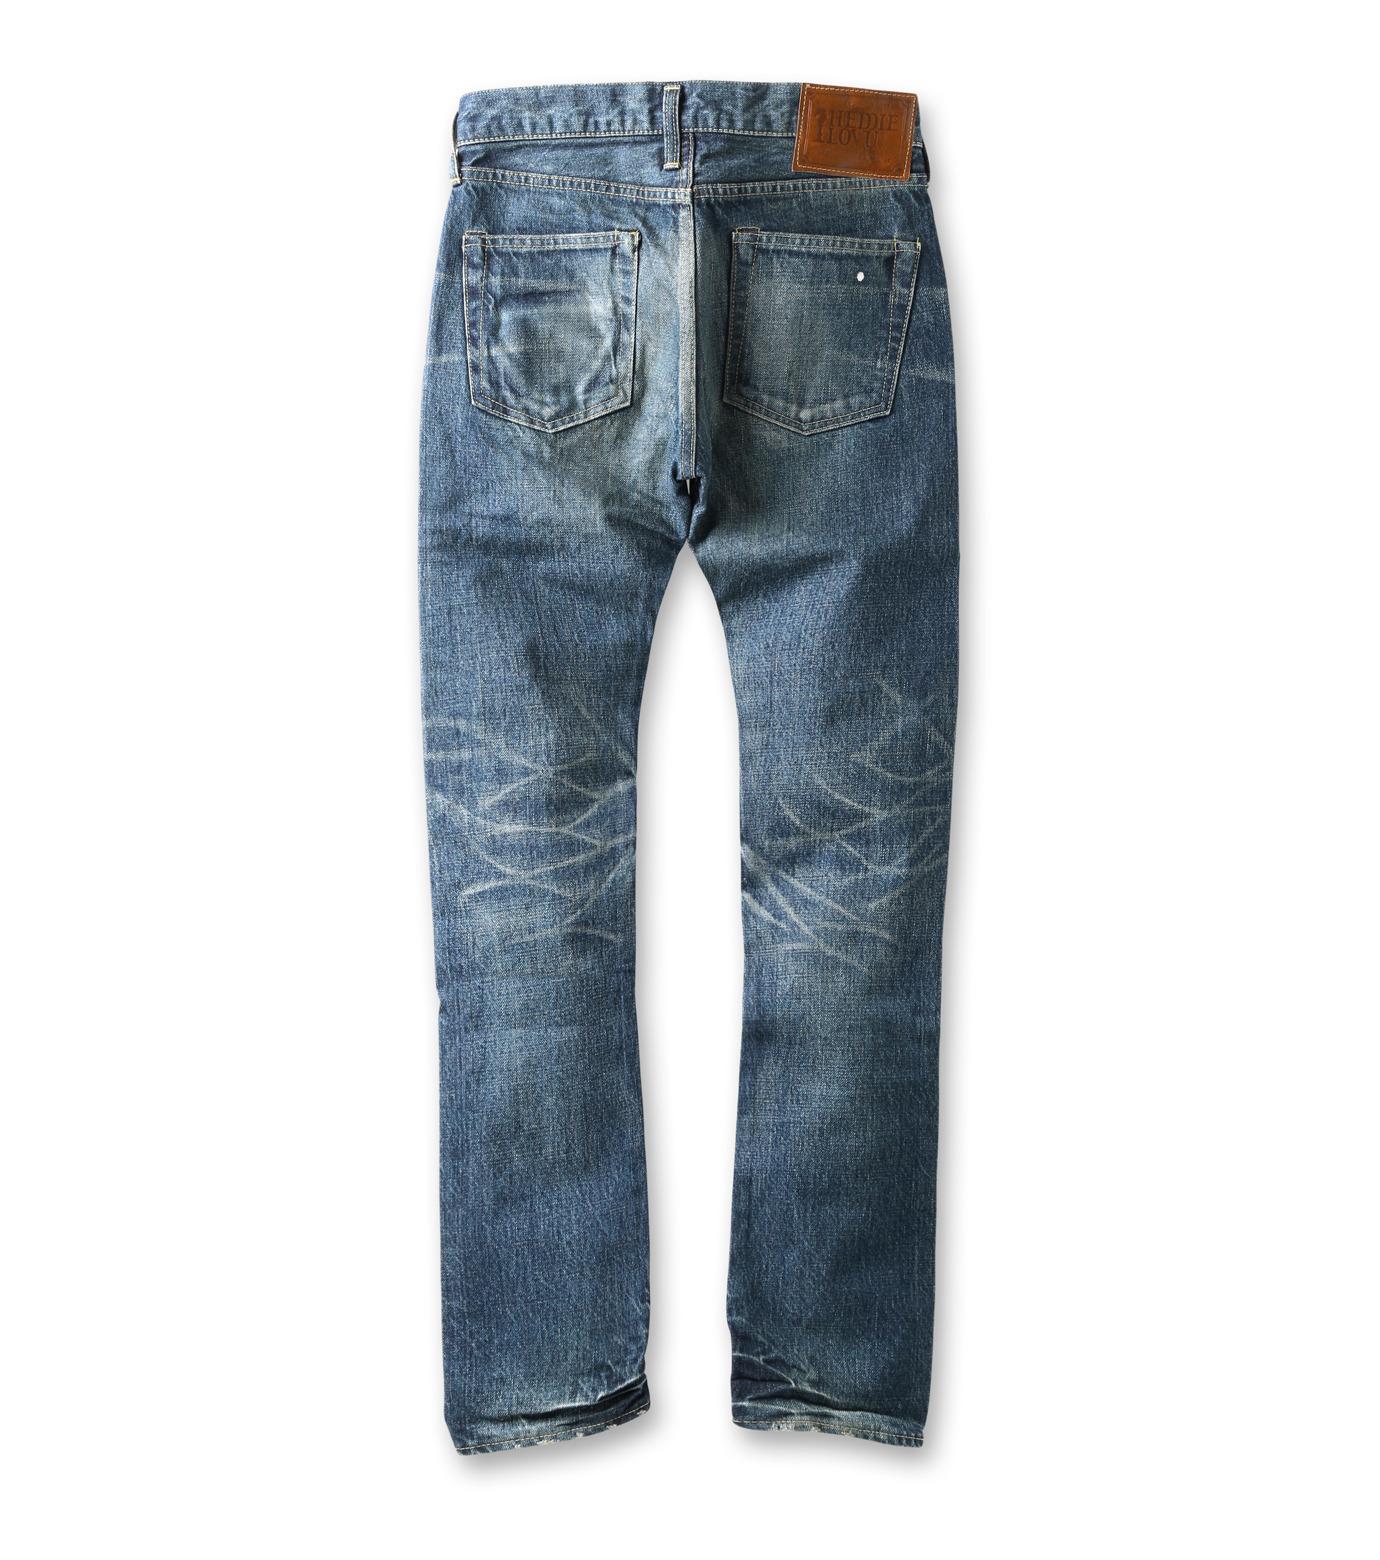 Heddie Lovu(エディー ルーヴ)のASHMidiumBody-BLUE(パンツ/pants)-ASH-MID-13A-92 拡大詳細画像2